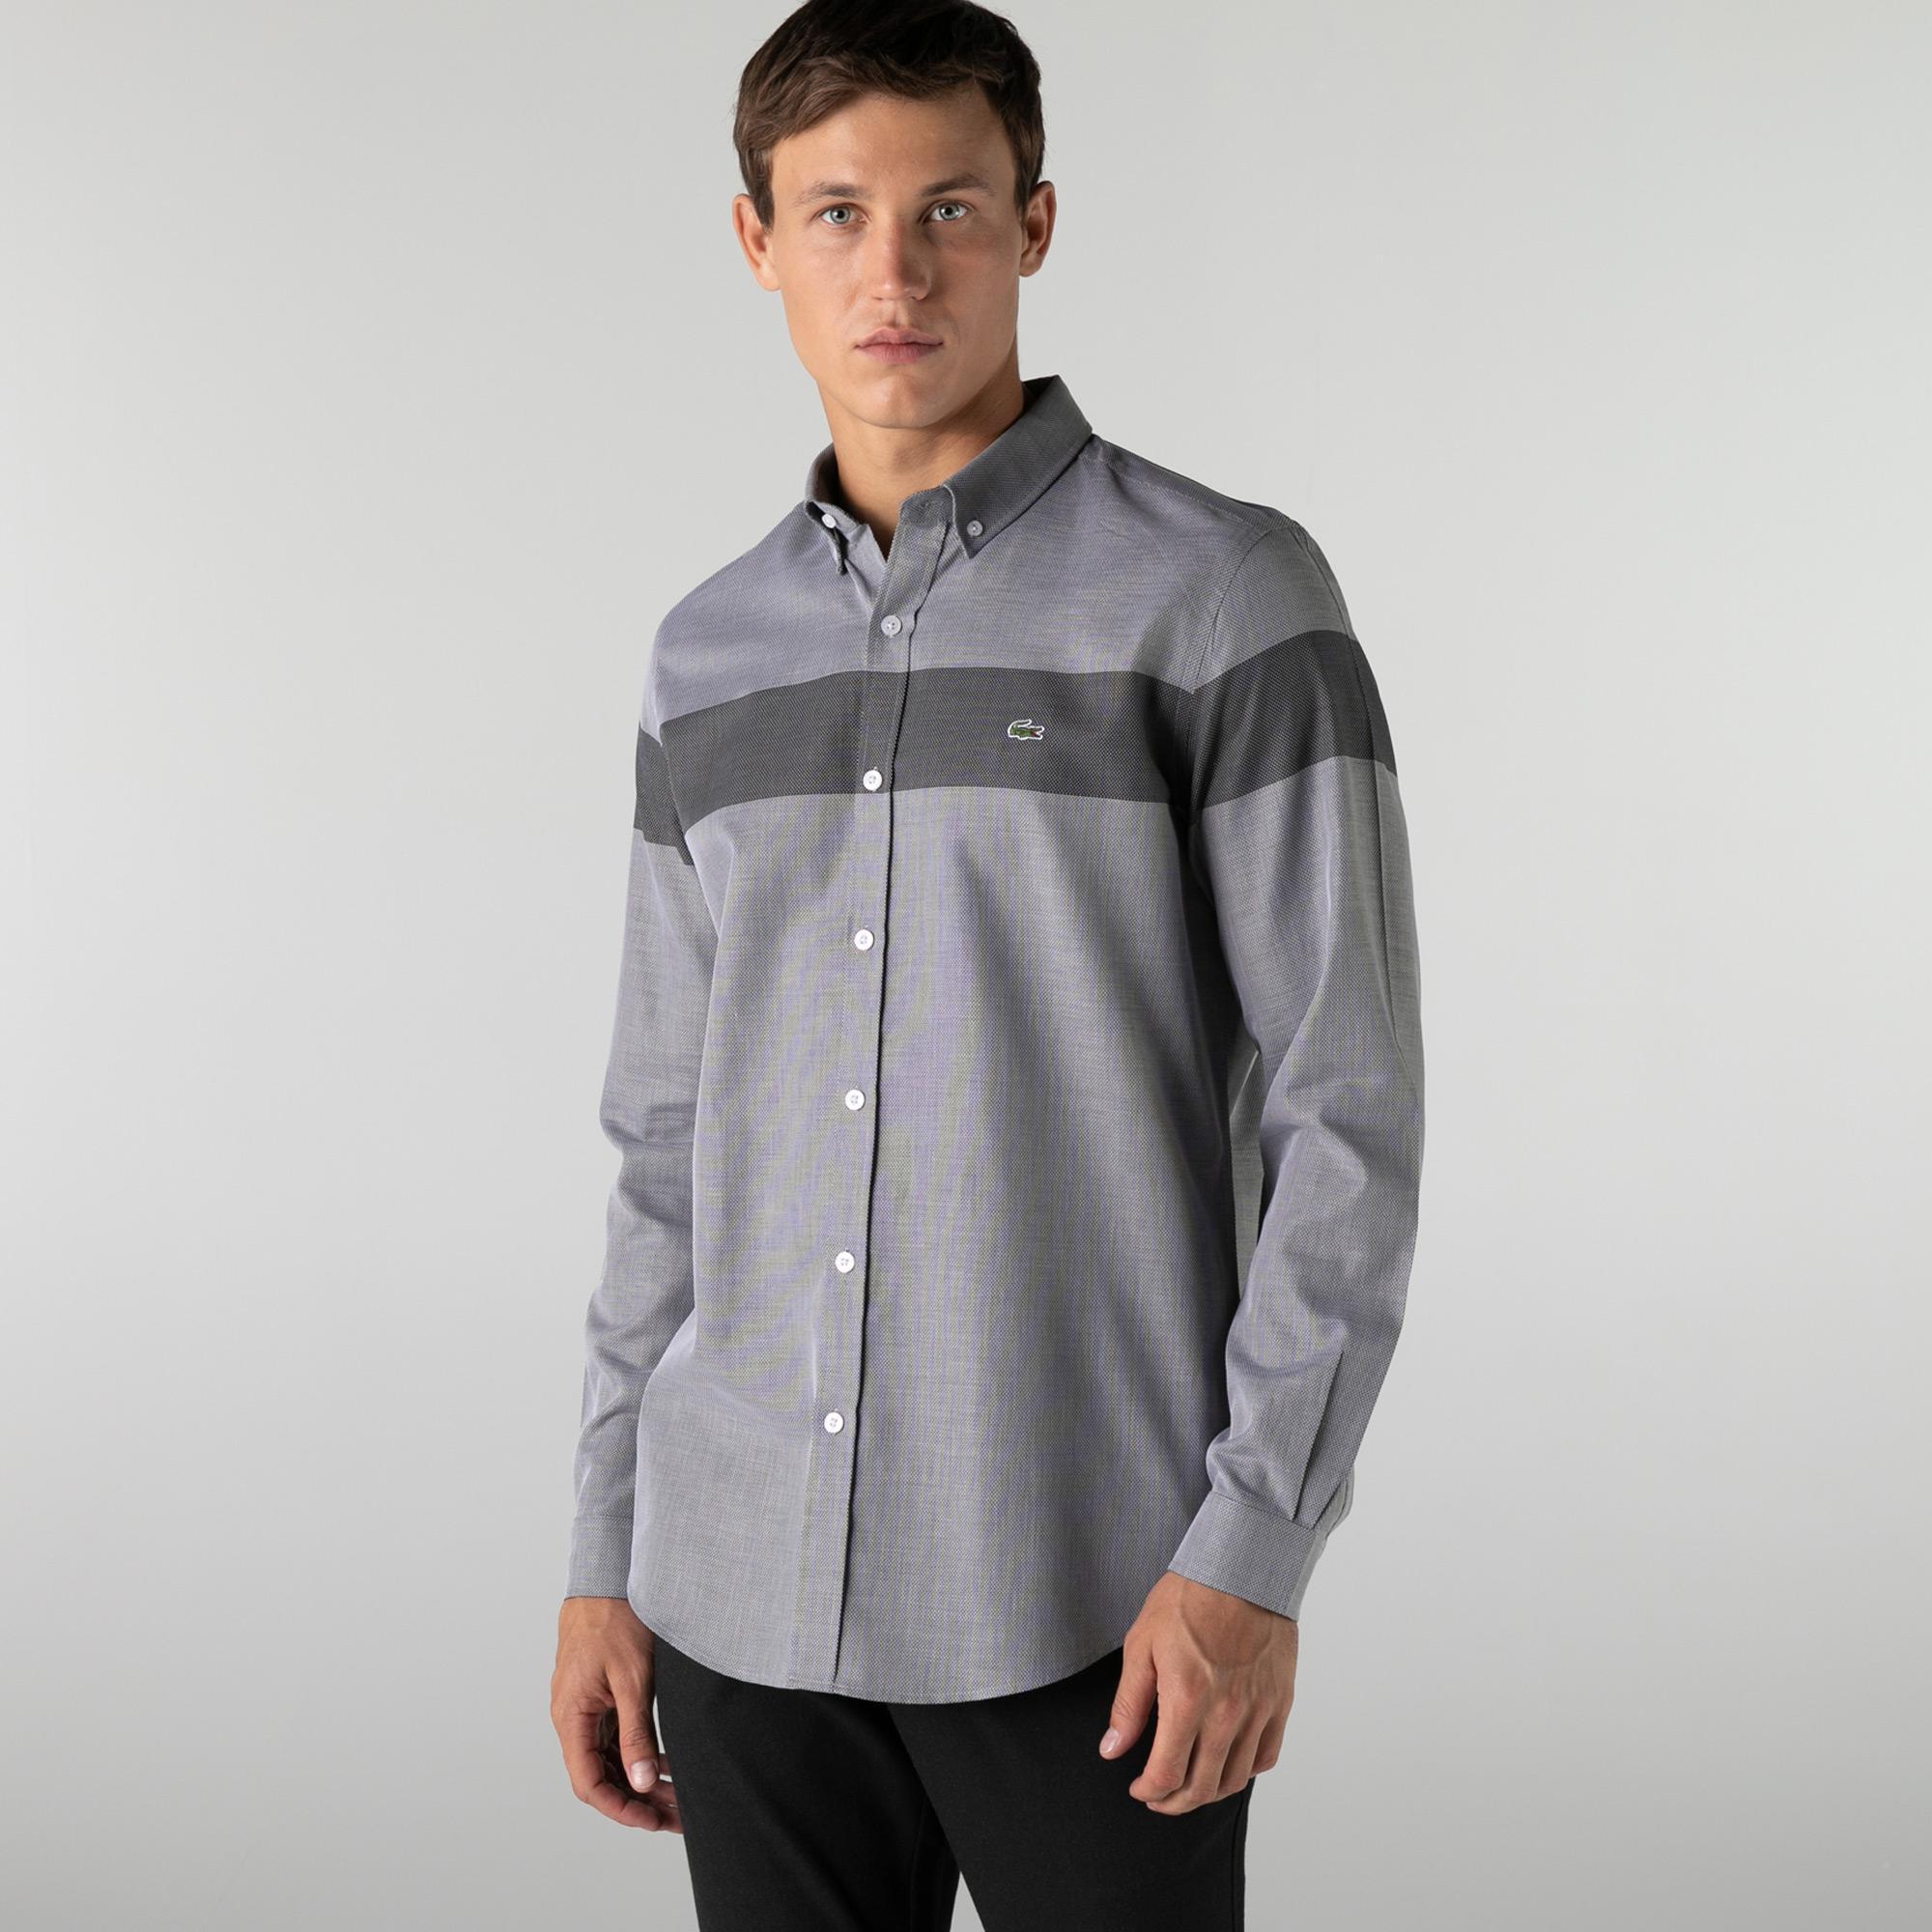 Lacoste Erkek Regular Fit Renk Bloklu Gri Gömlek